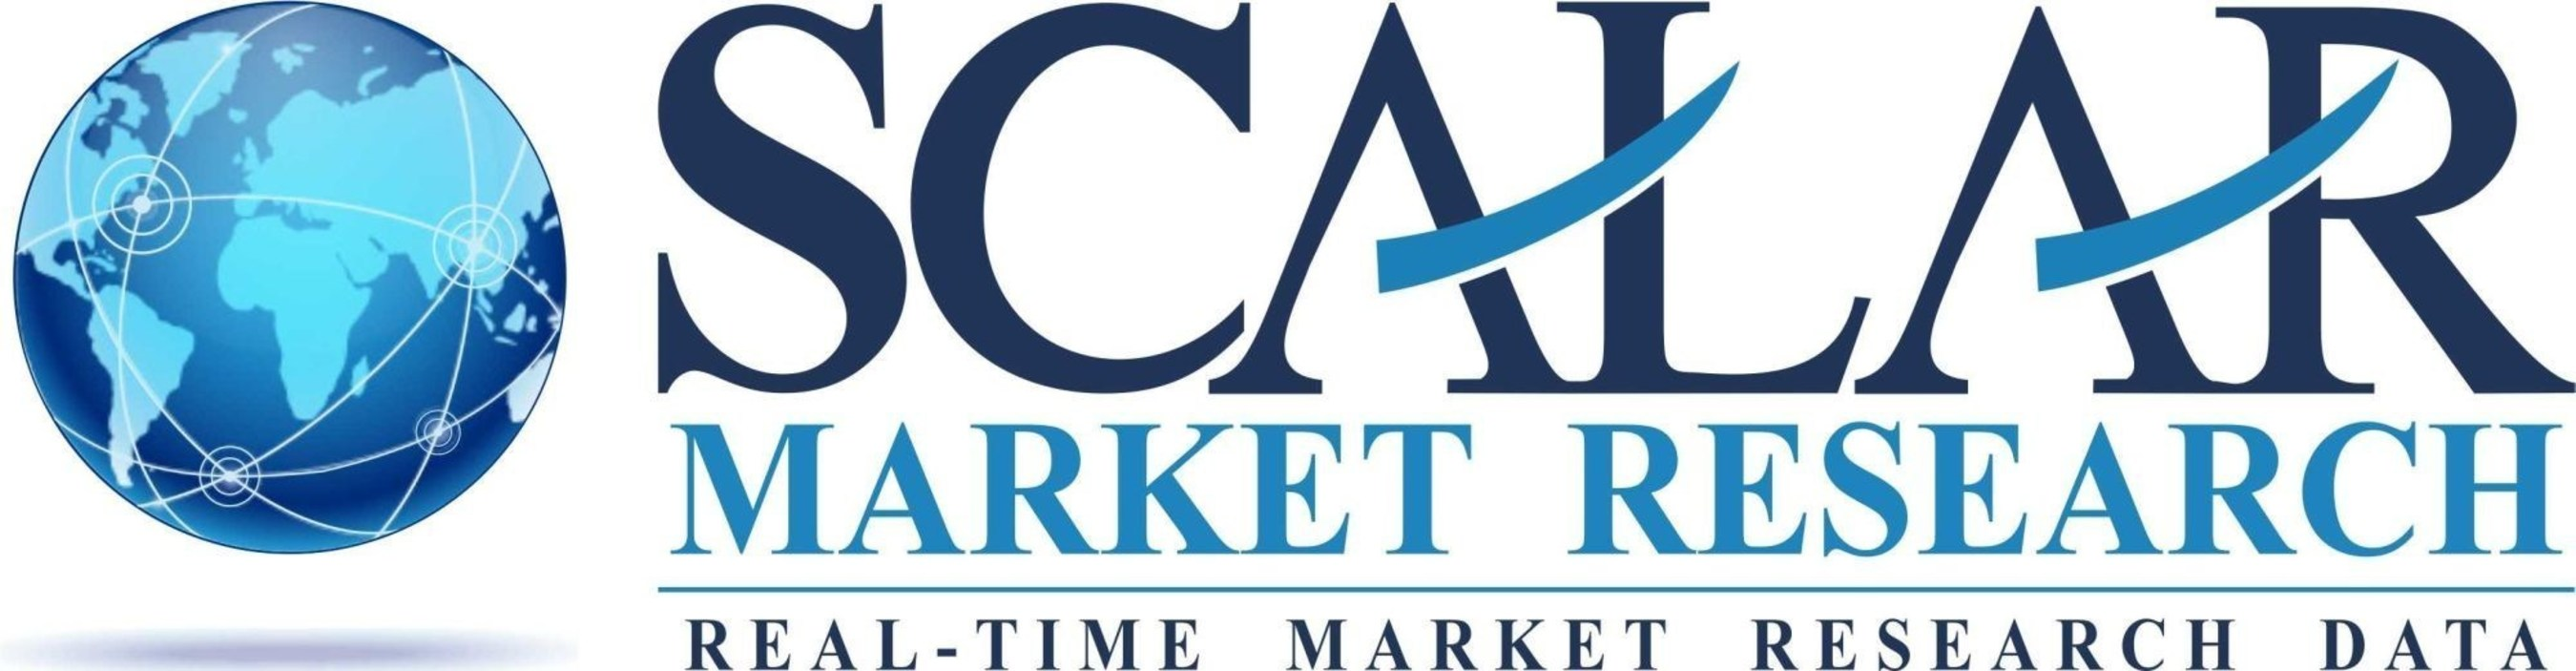 Cloud Infrastructure Market Worth USD 66.46 Billion by 2022 - Scalar Market Research